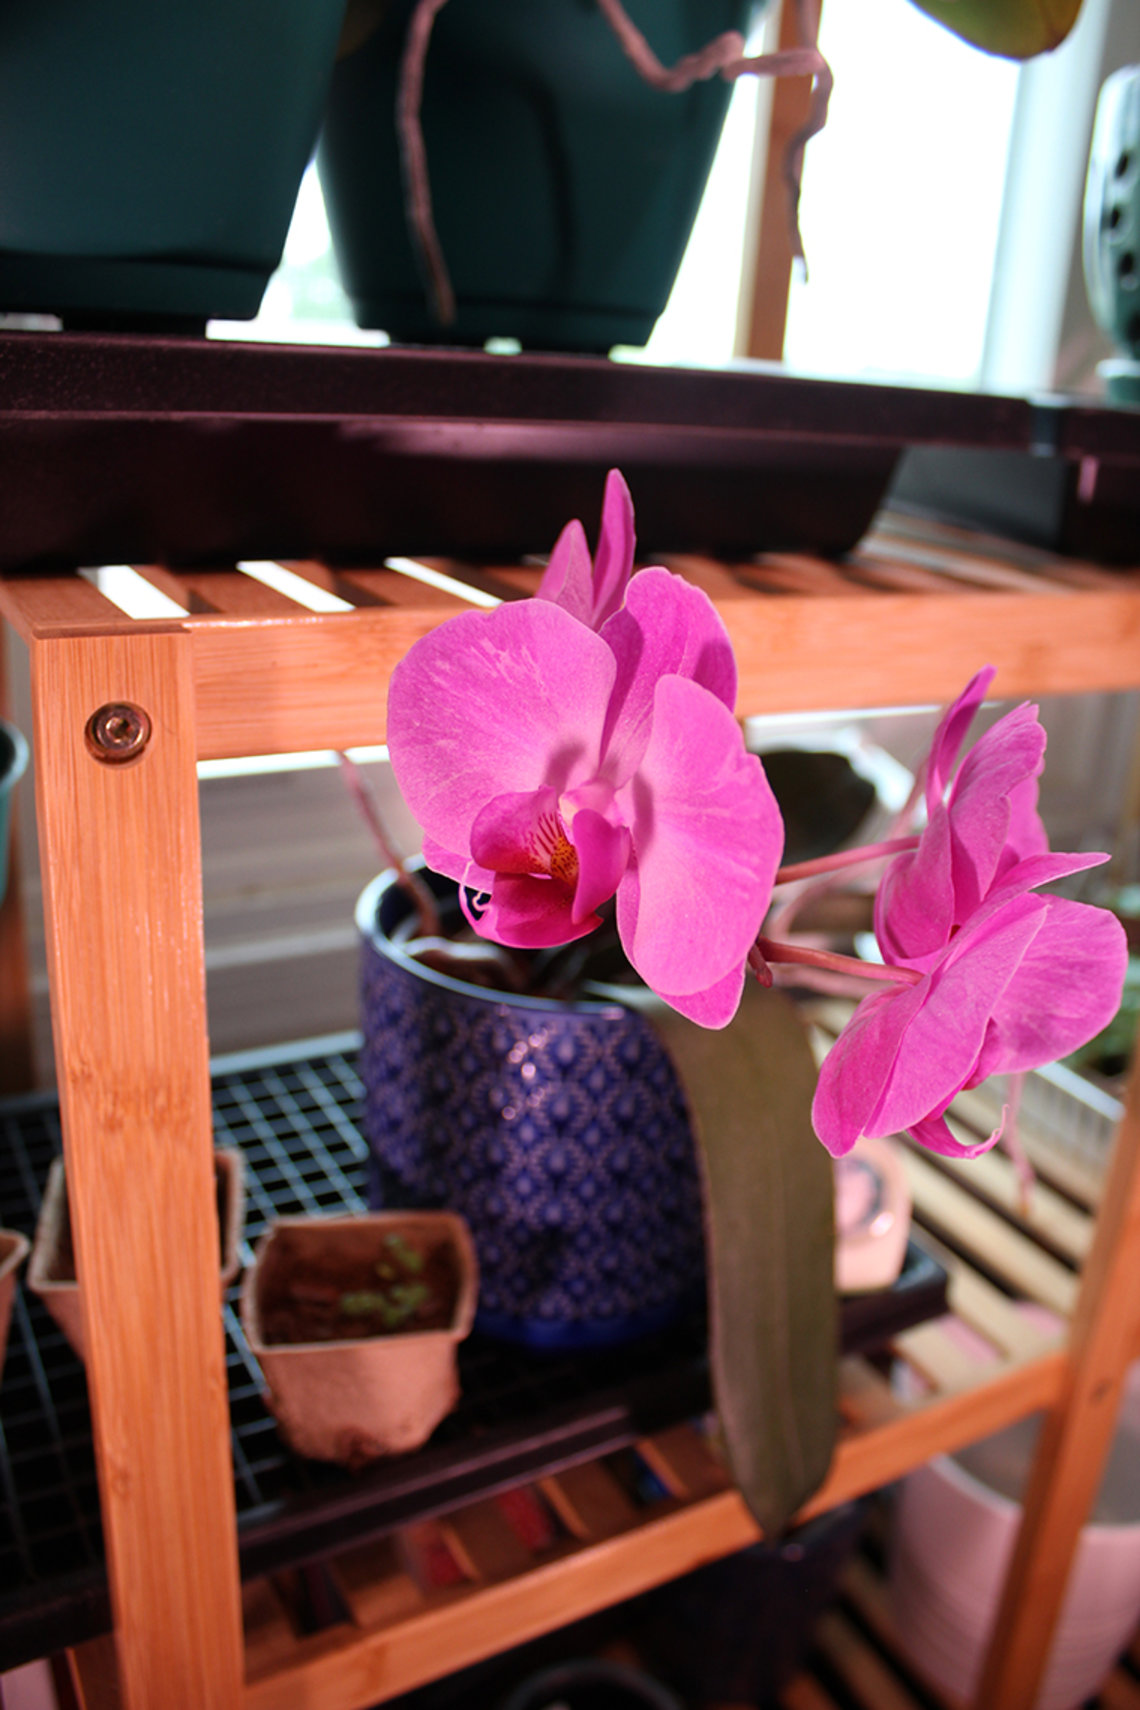 A pink phalaenopsis blossoms.